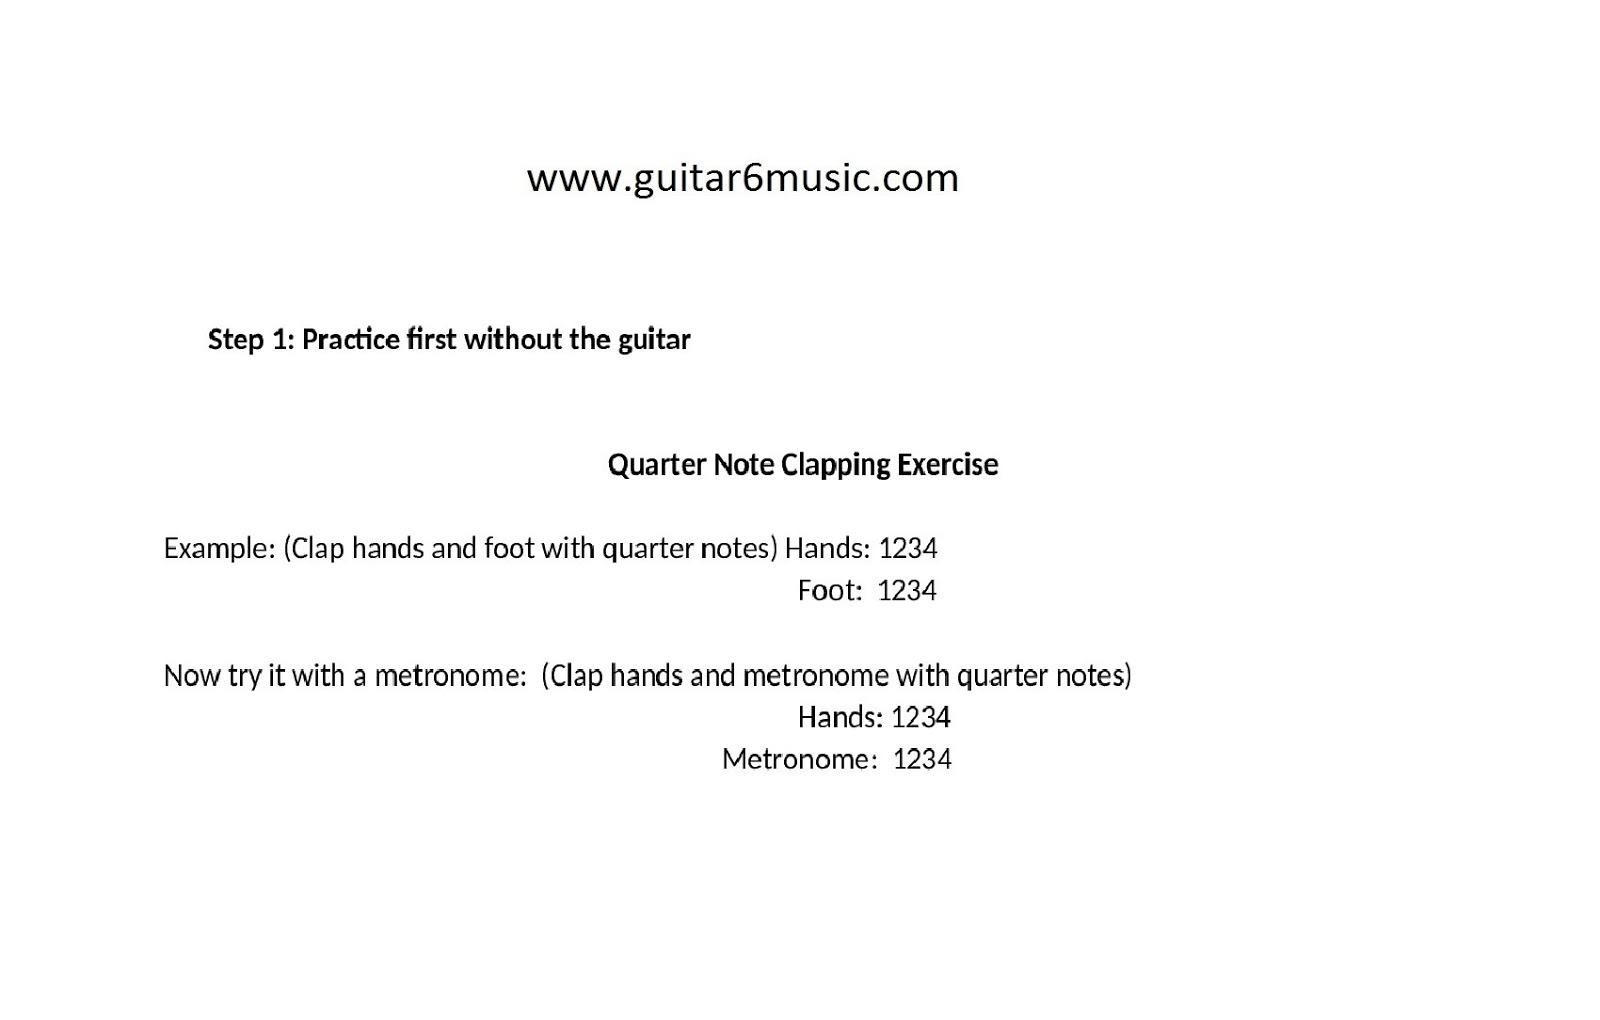 Guitar Trix & Tips Blog: Book Reviews, Product Reviews